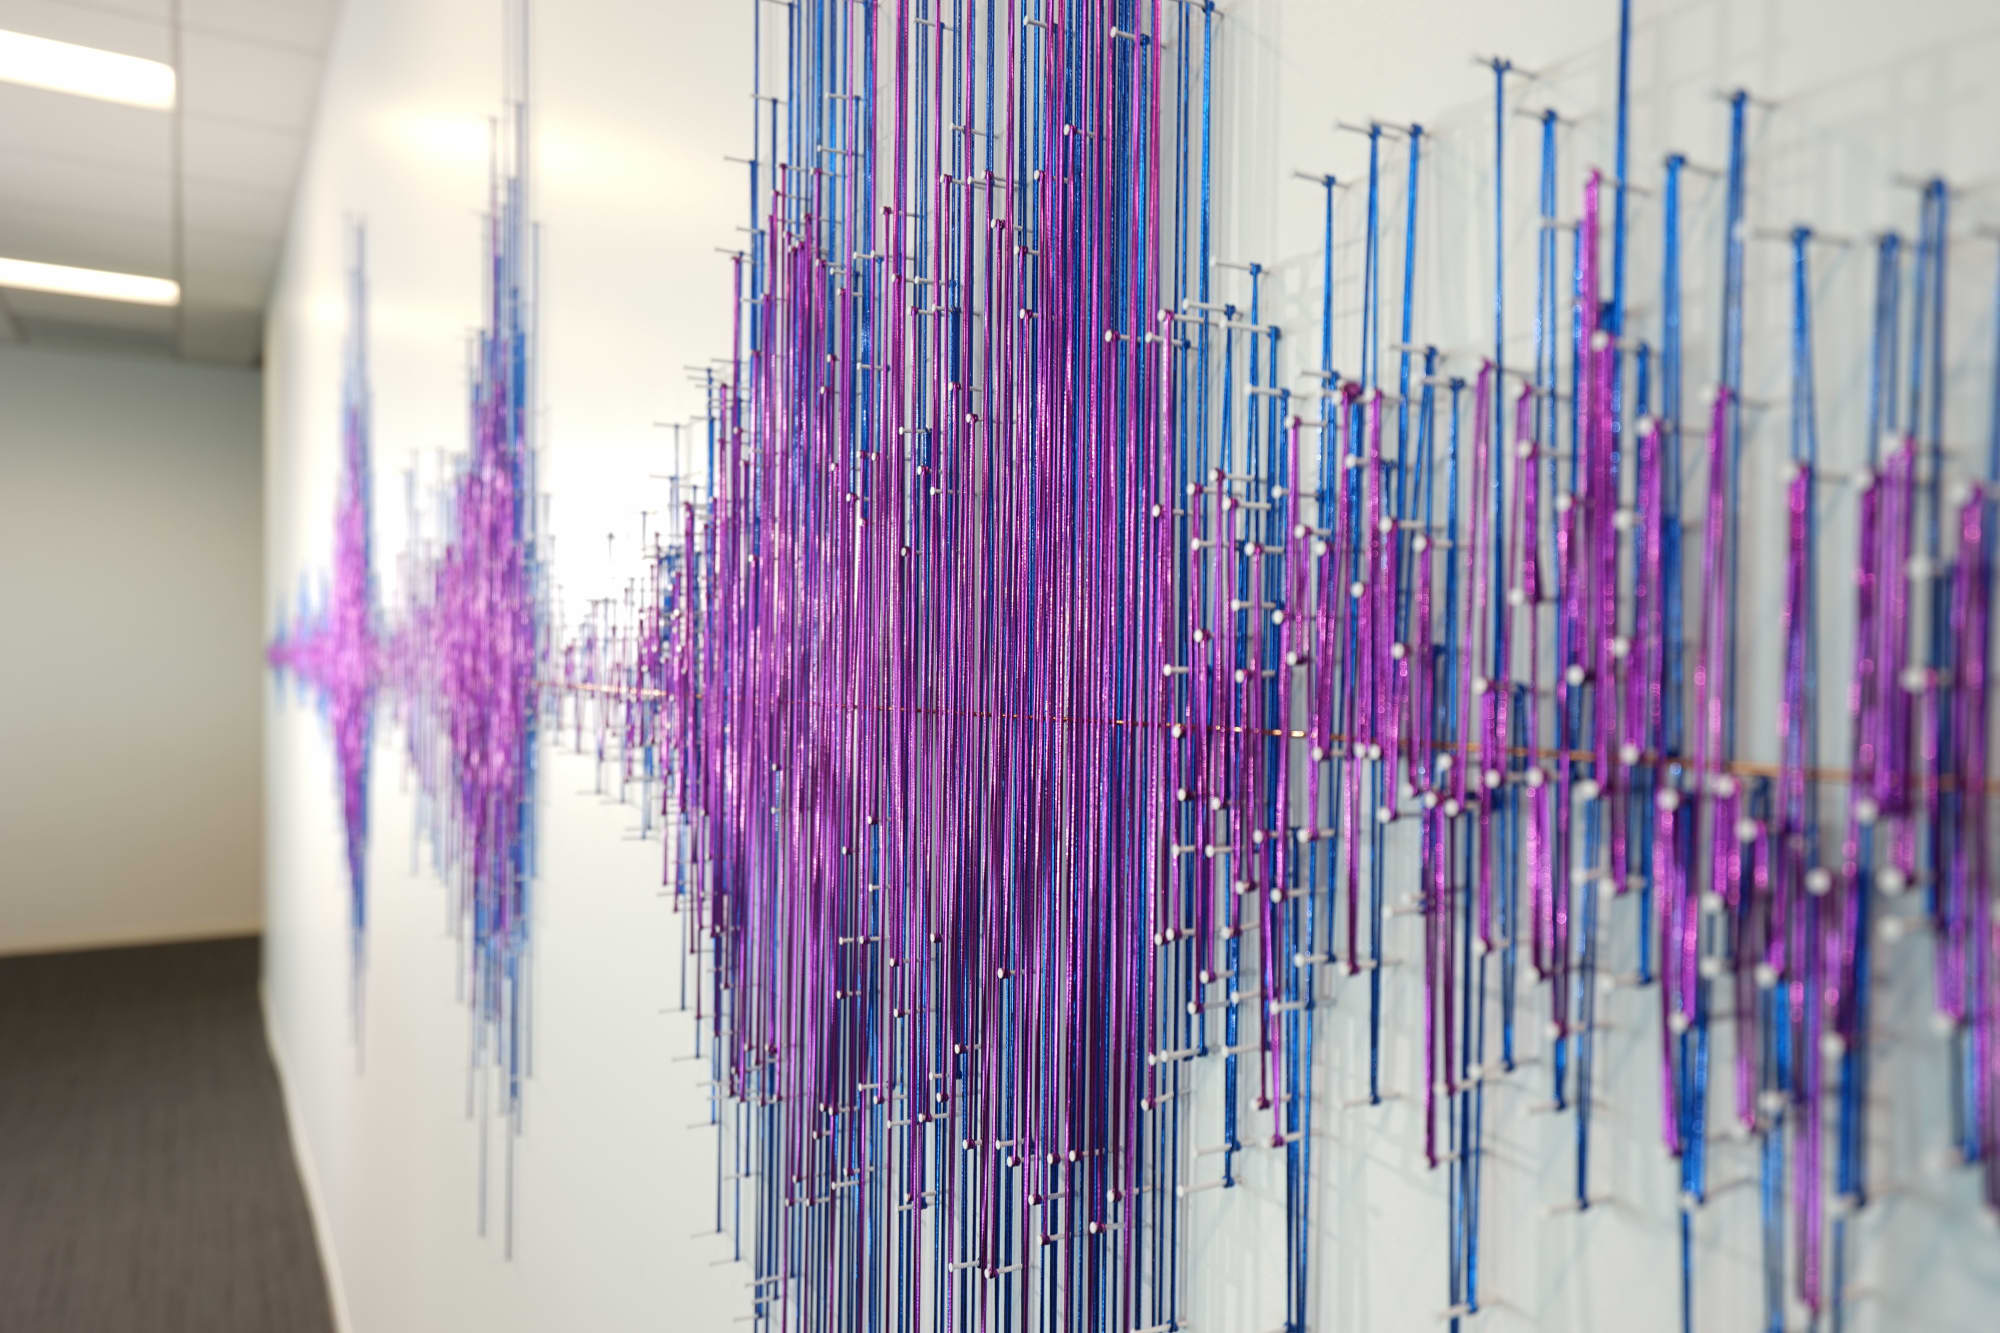 Fiber Sound Wave Sculpture in Blue and Purple